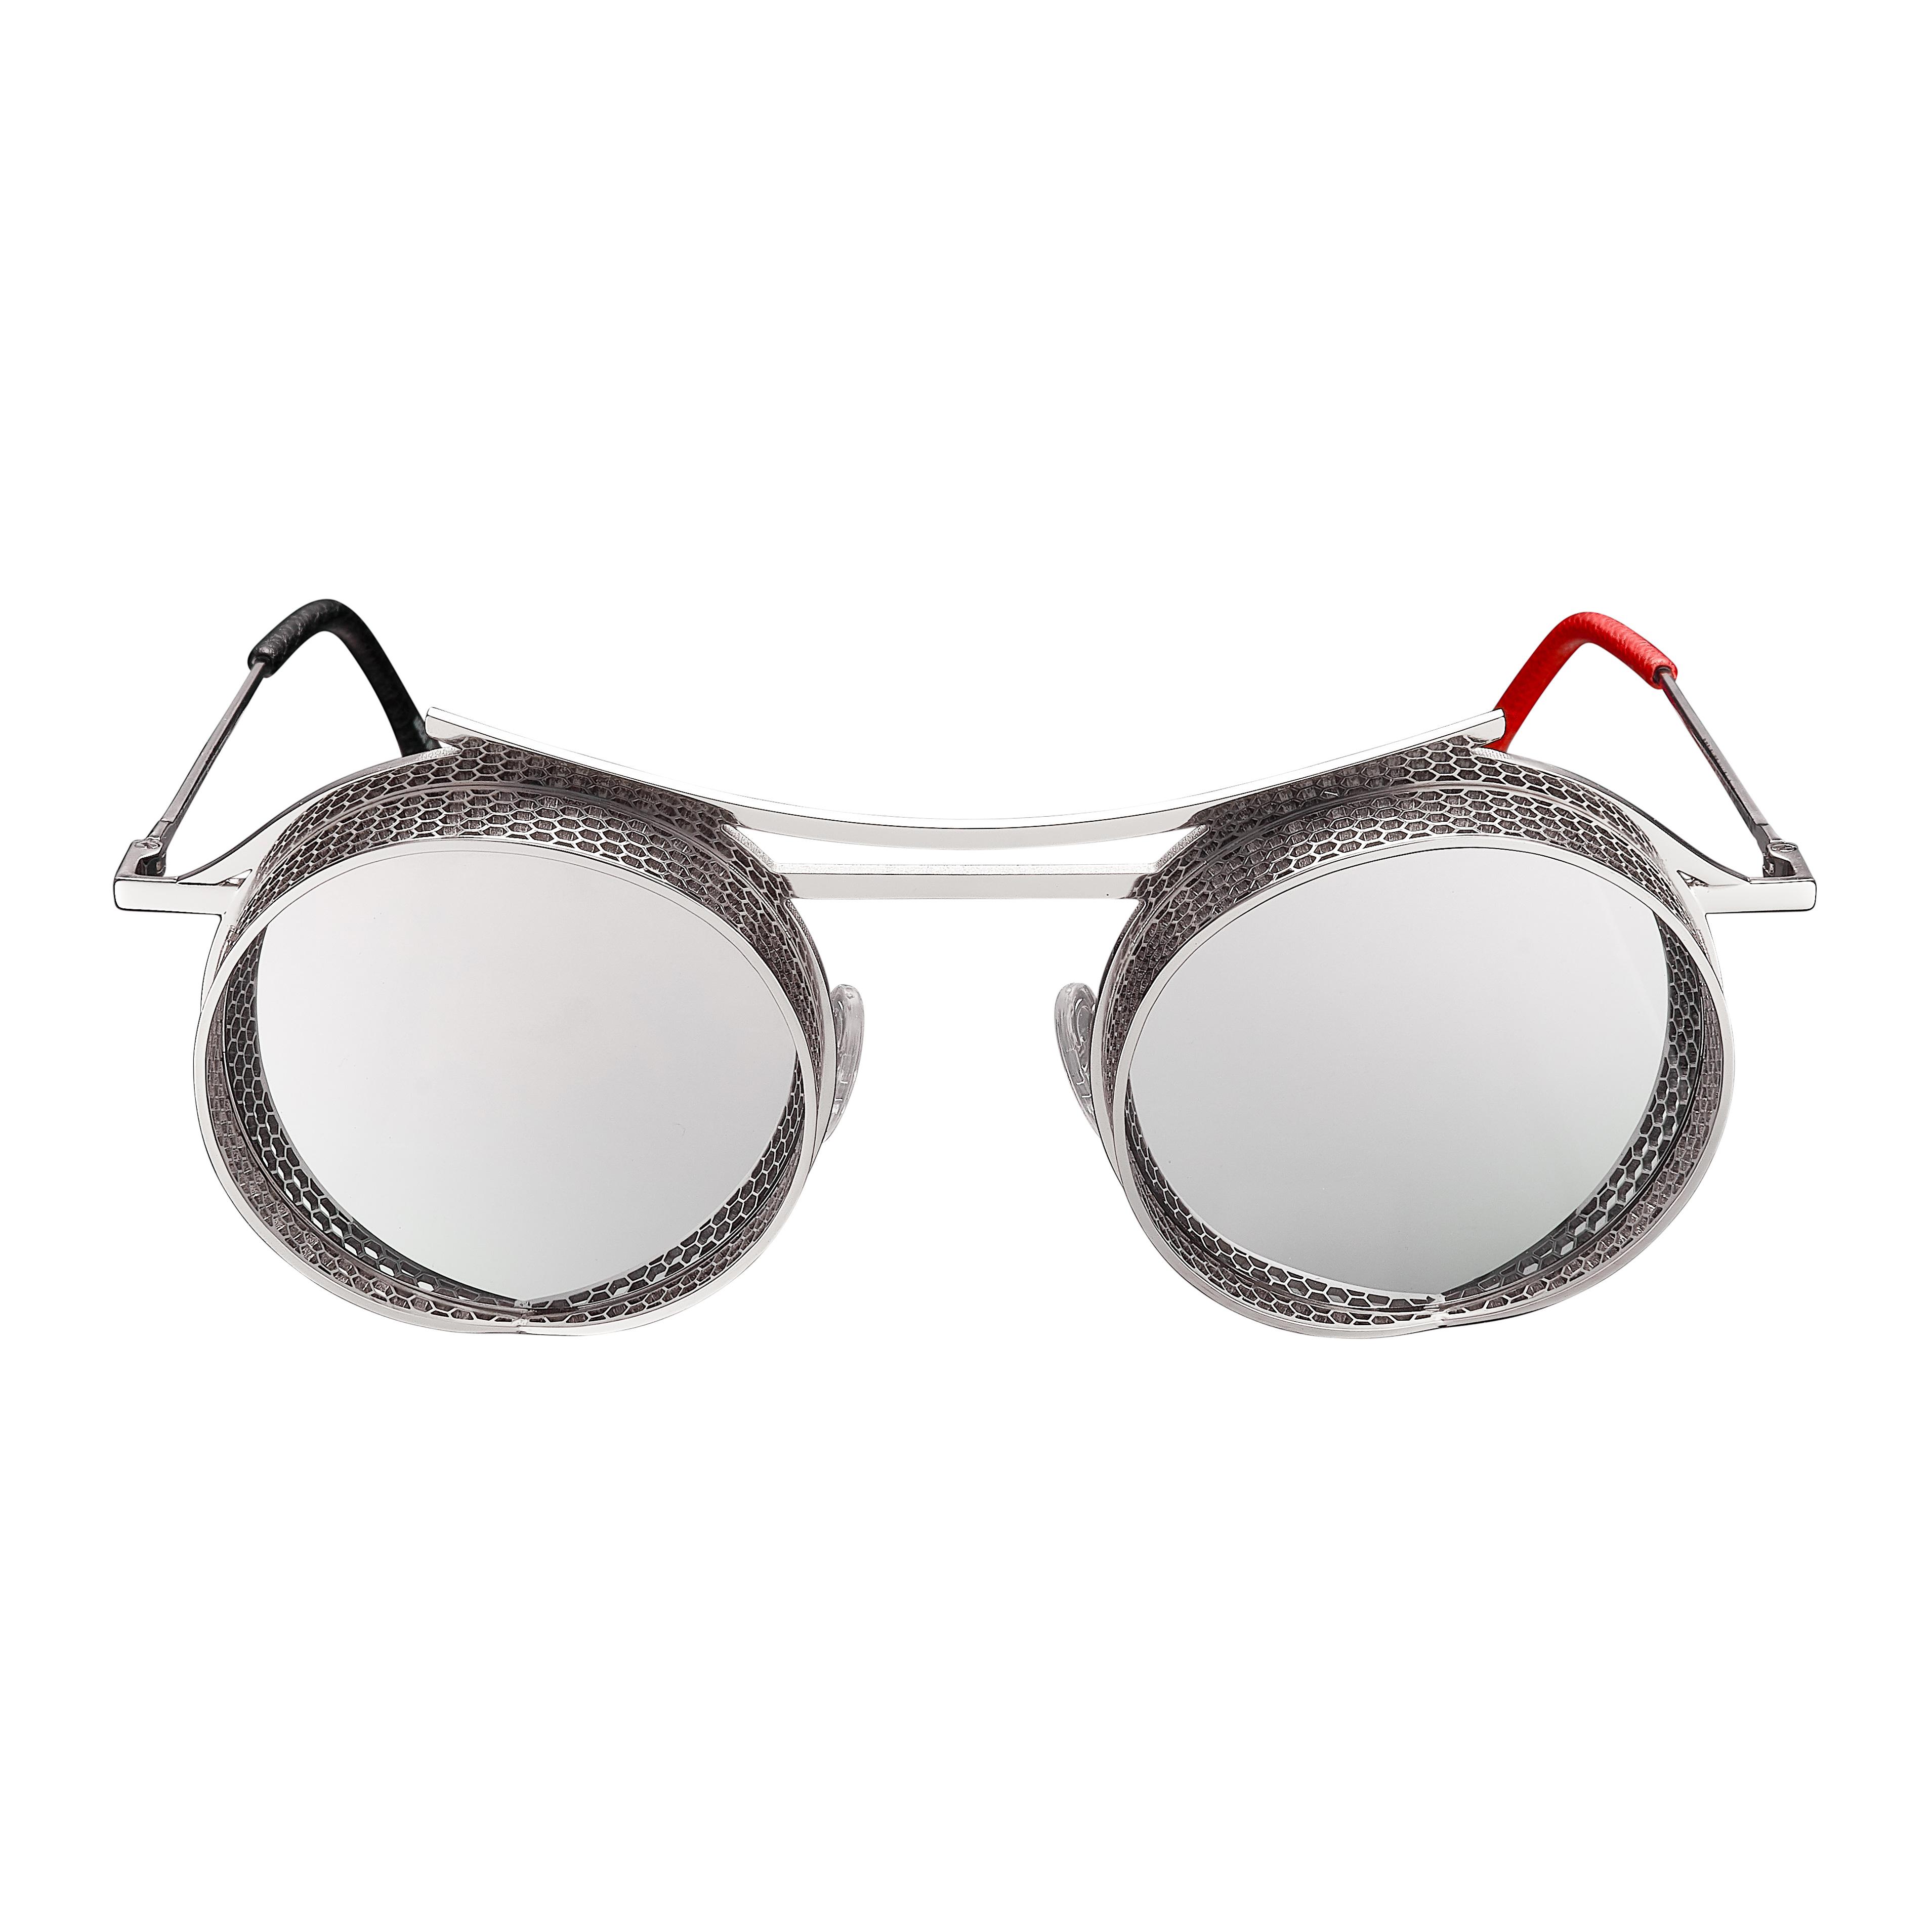 ONIX - OX - 2 - Shiny Silver Frame + Silver Mirror Lenses